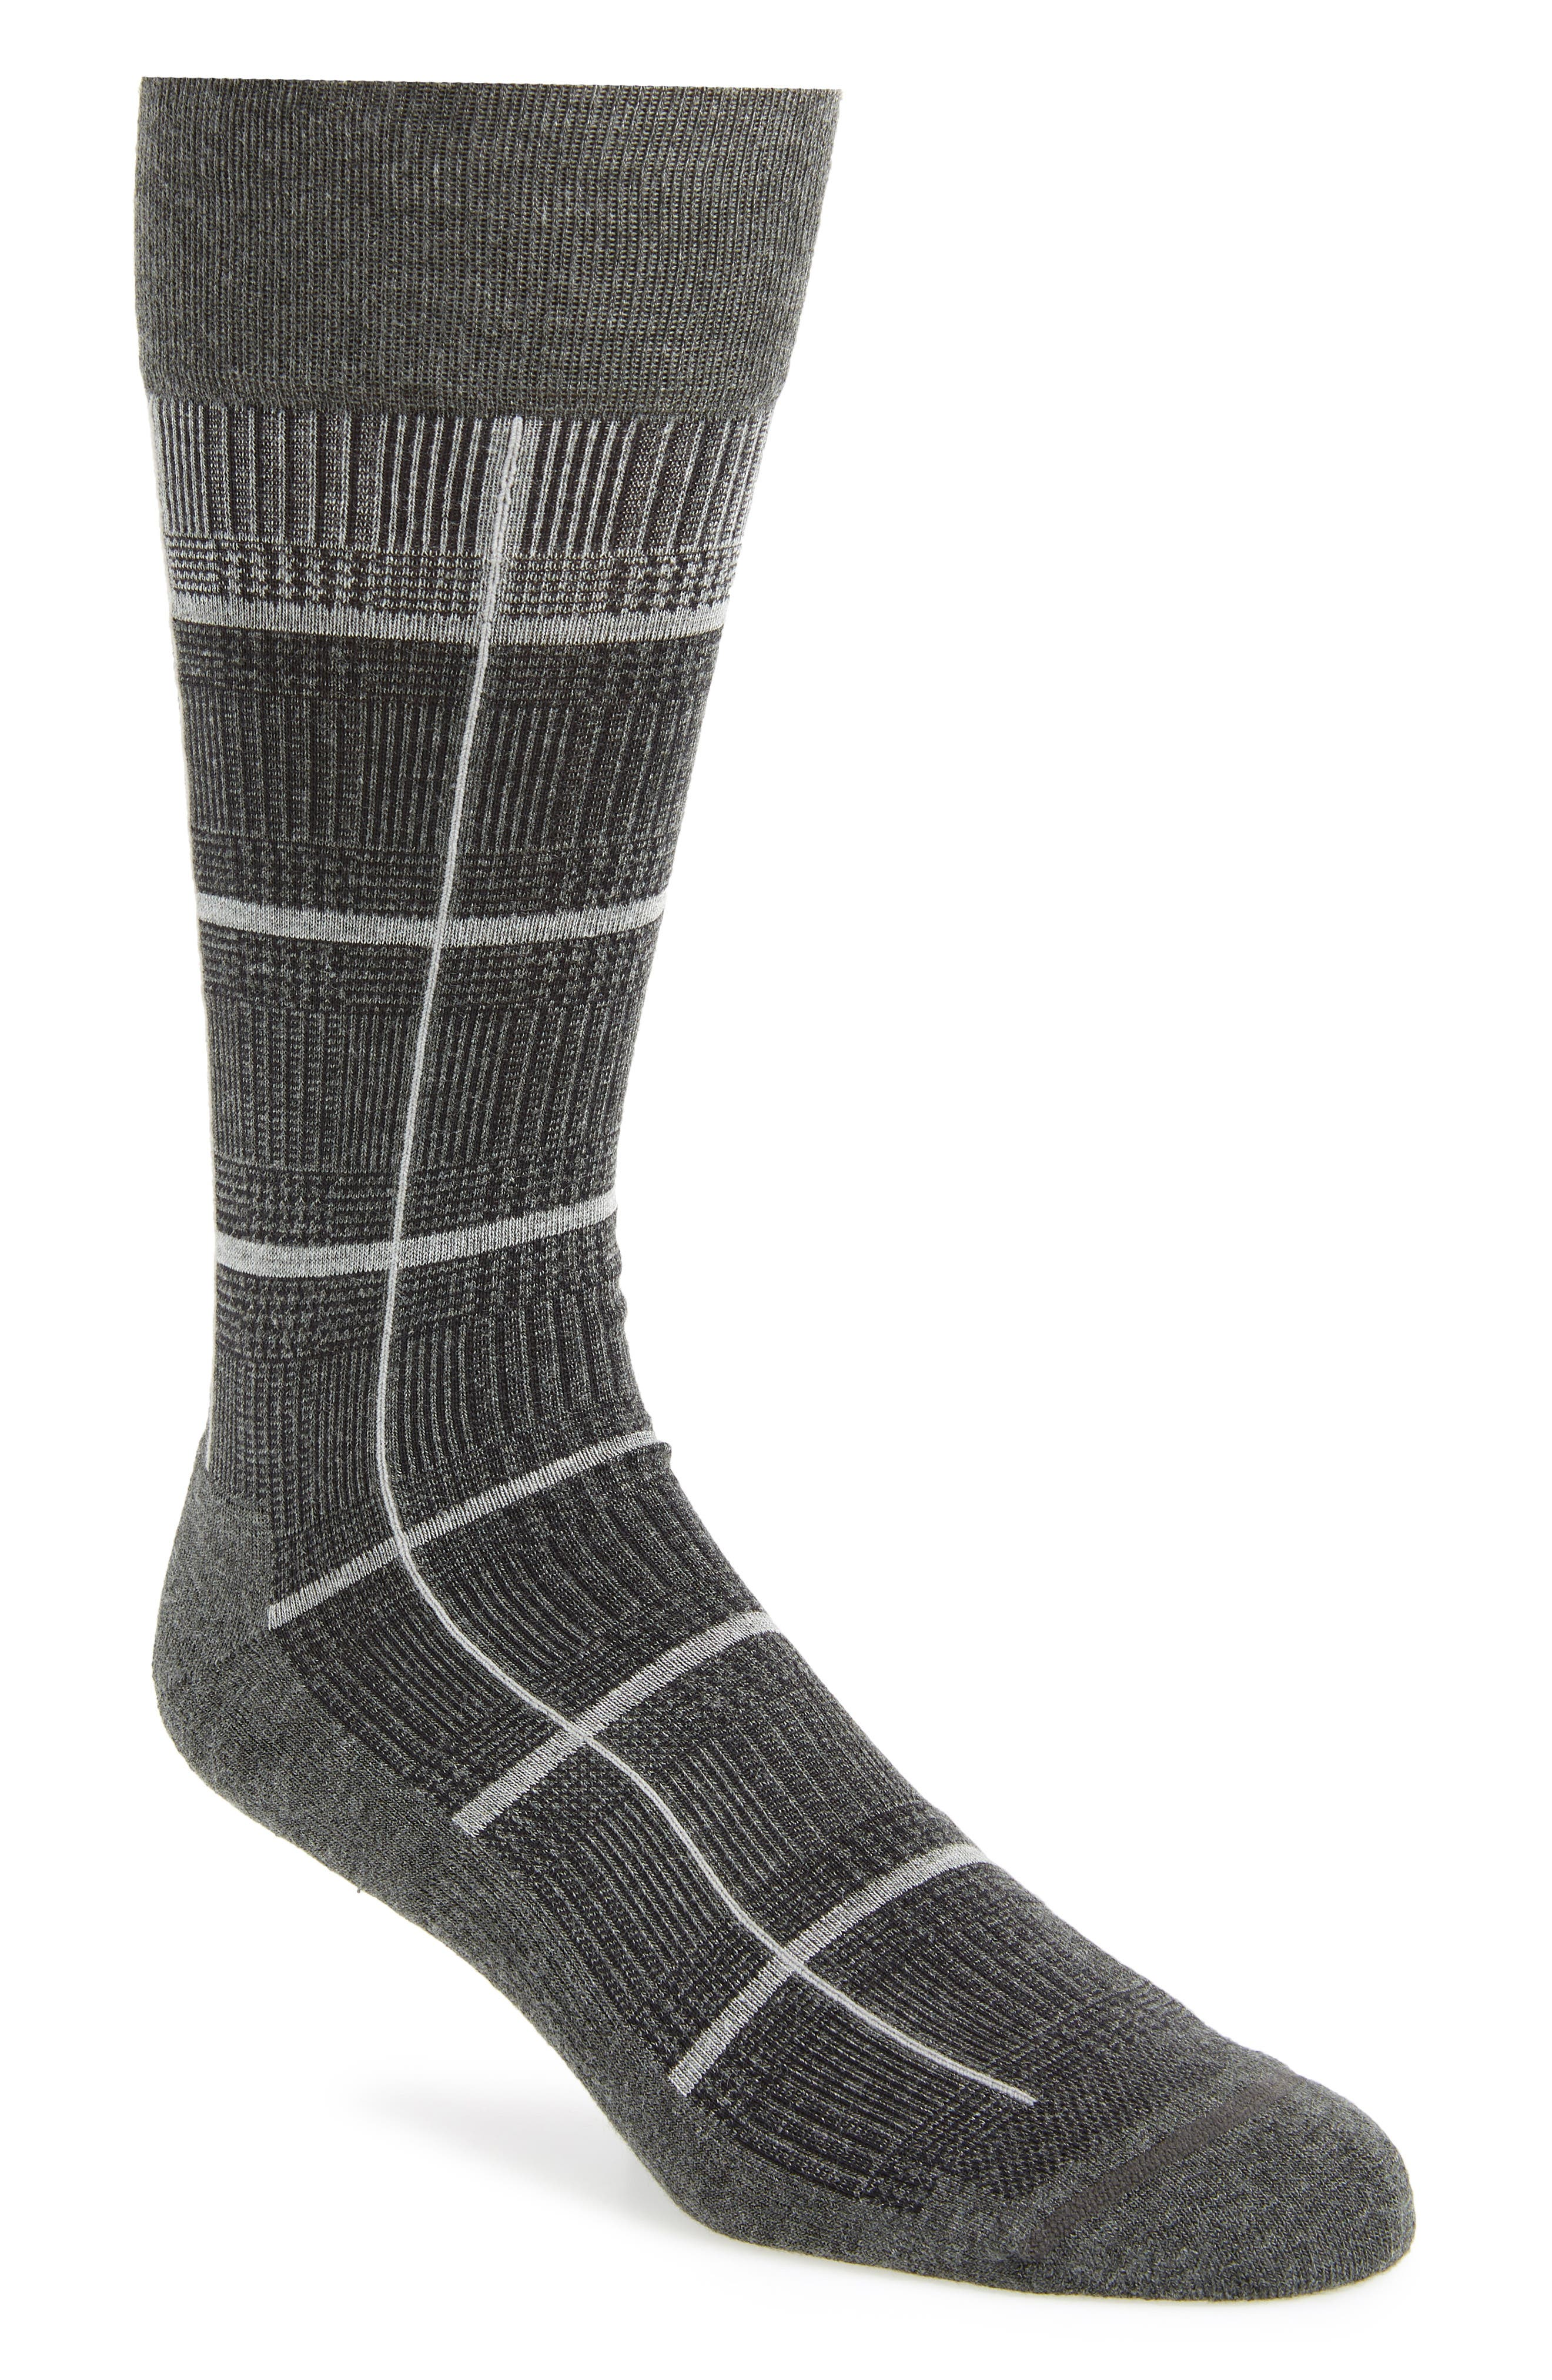 Glen Plaid Socks,                         Main,                         color, CHARCOAL HEATHER